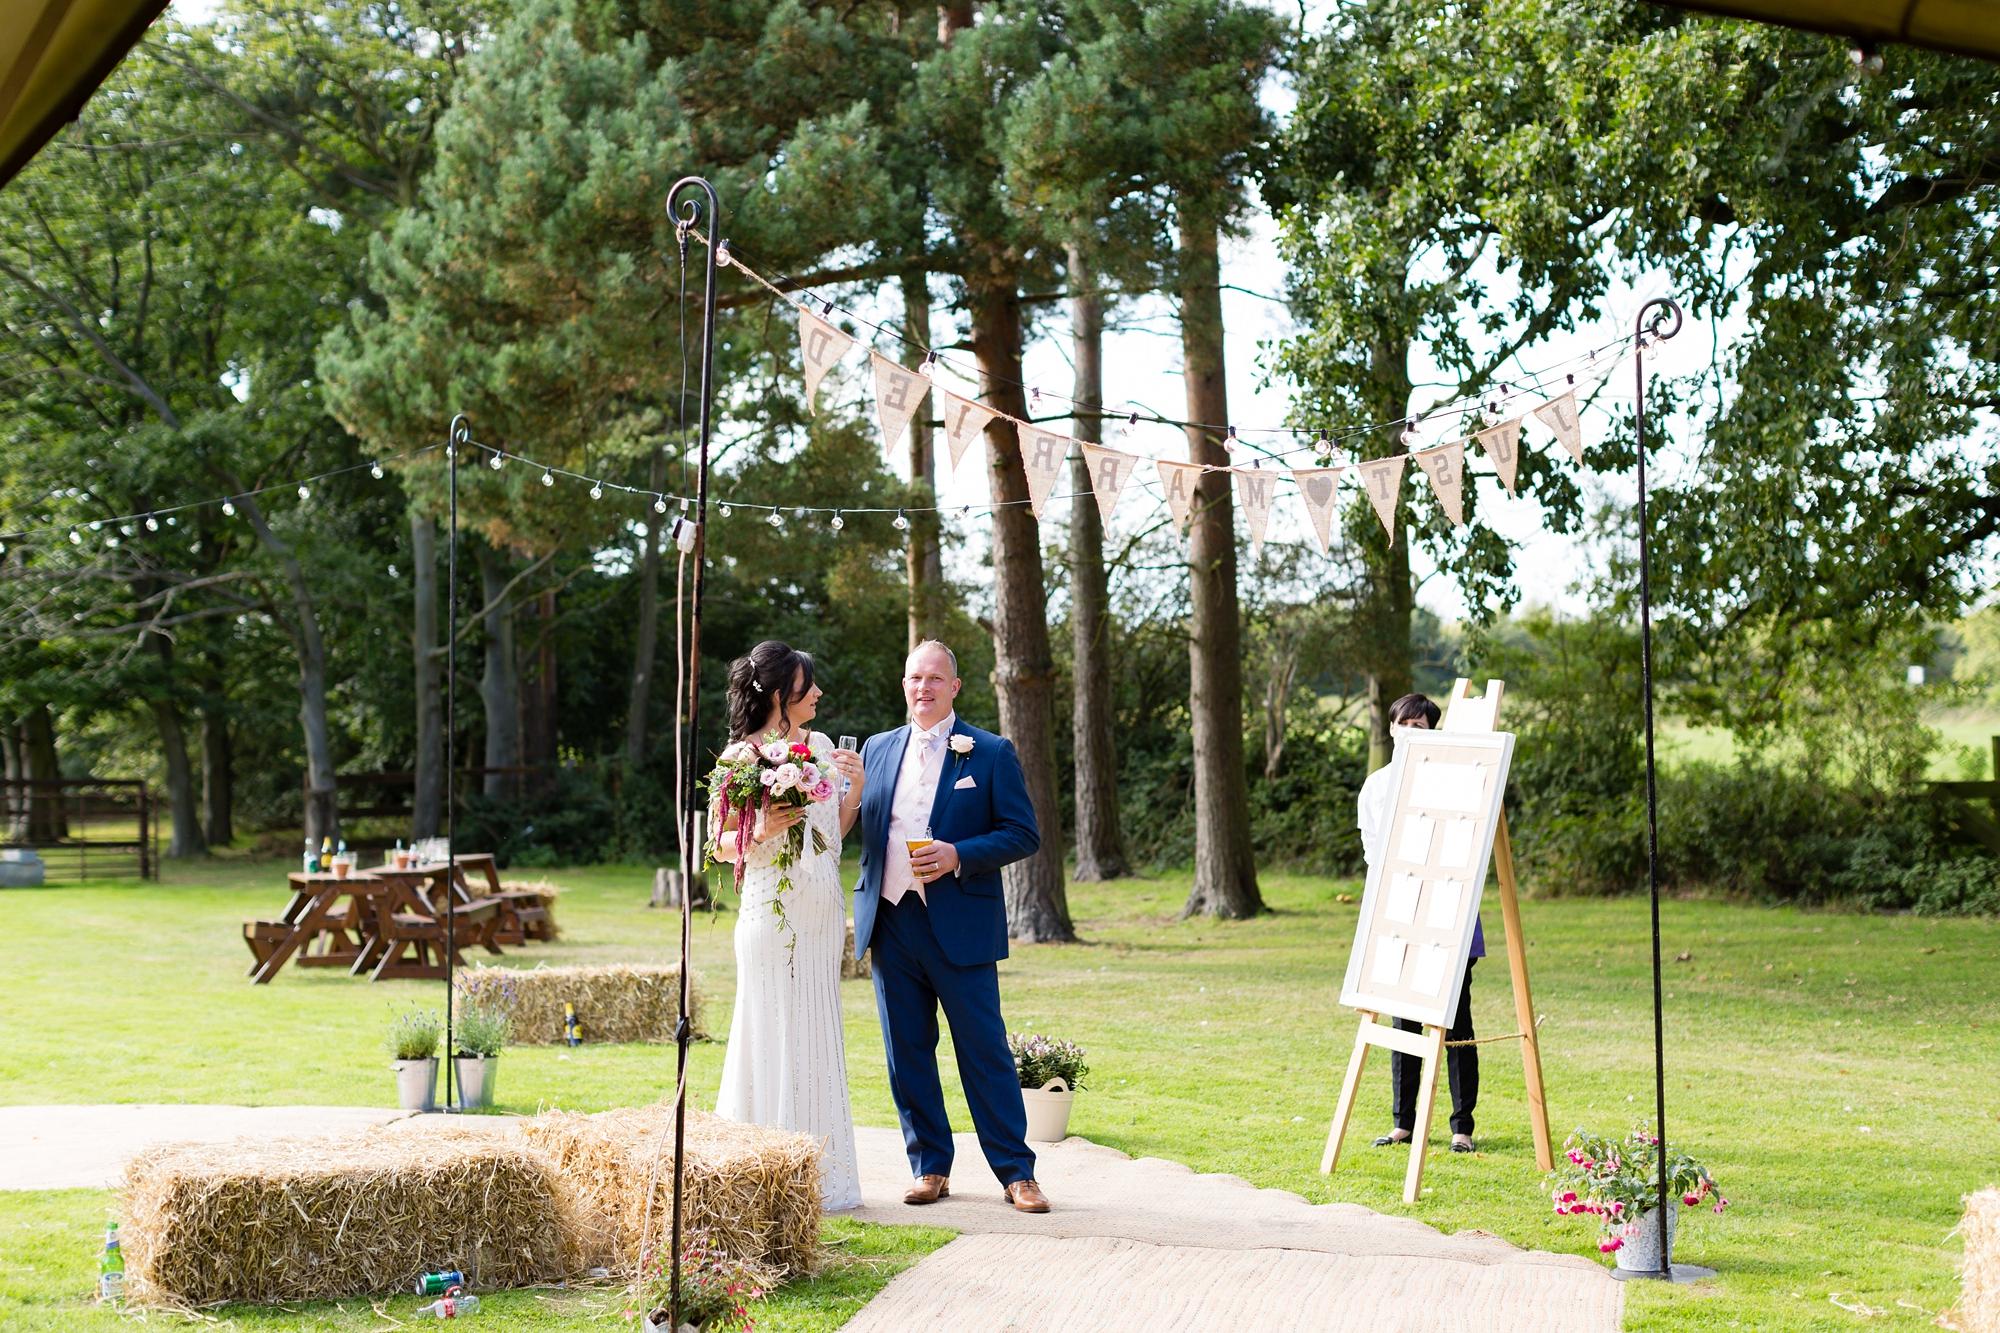 Villa Farm Weddings bride and groom walk up to tipi